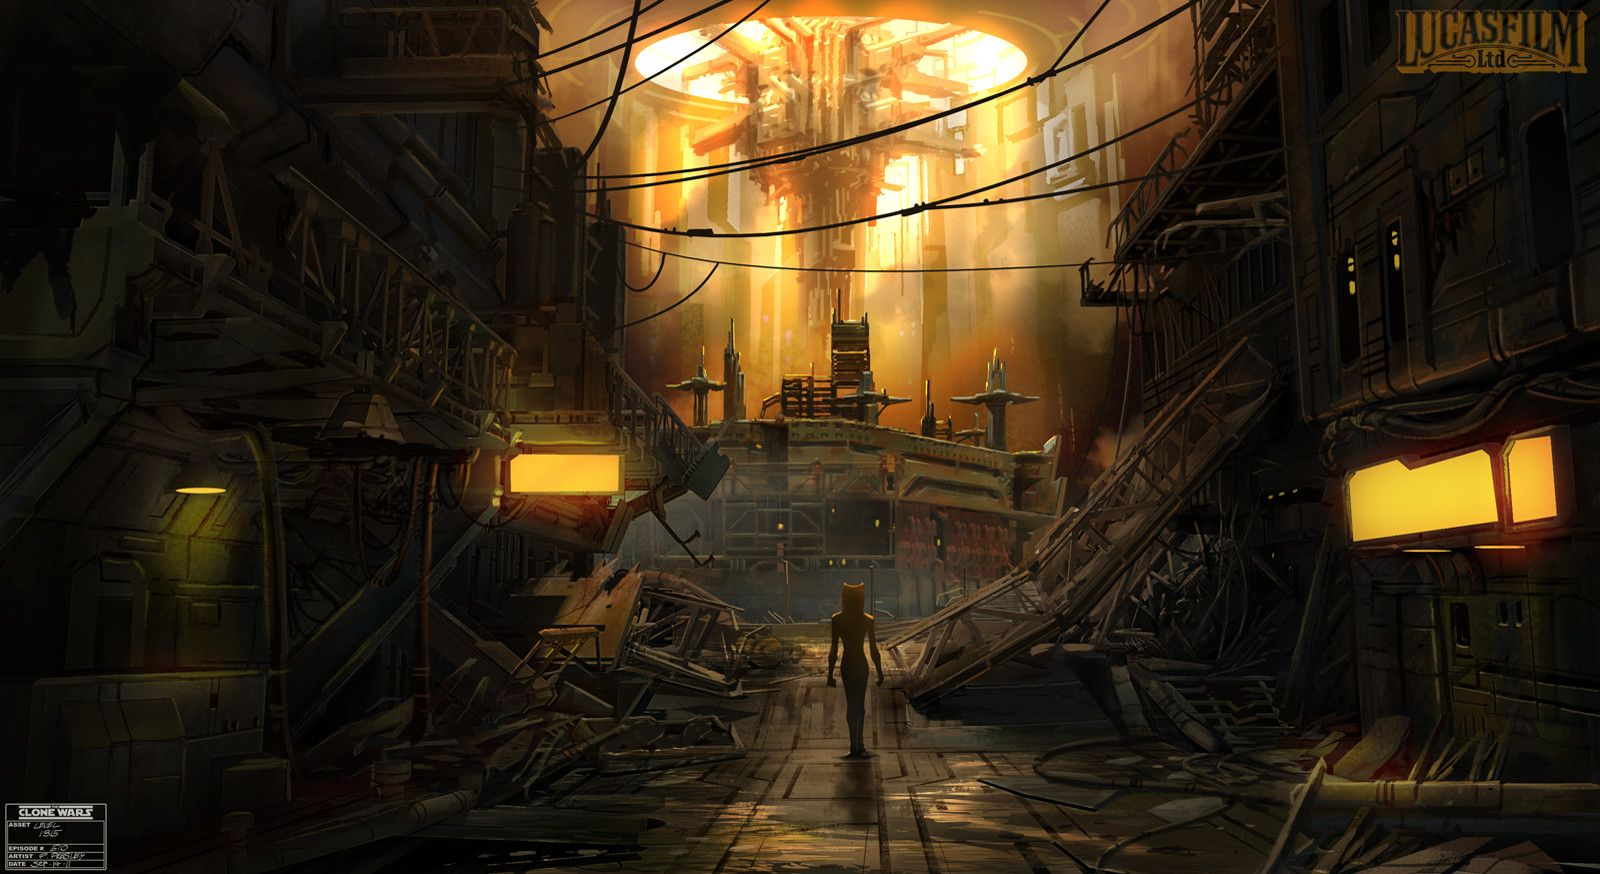 Coruscant Underworld Pat Presley Star Wars Coruscant Underworld Concept Art 1367015 Hd Wallpaper Backgrounds Download